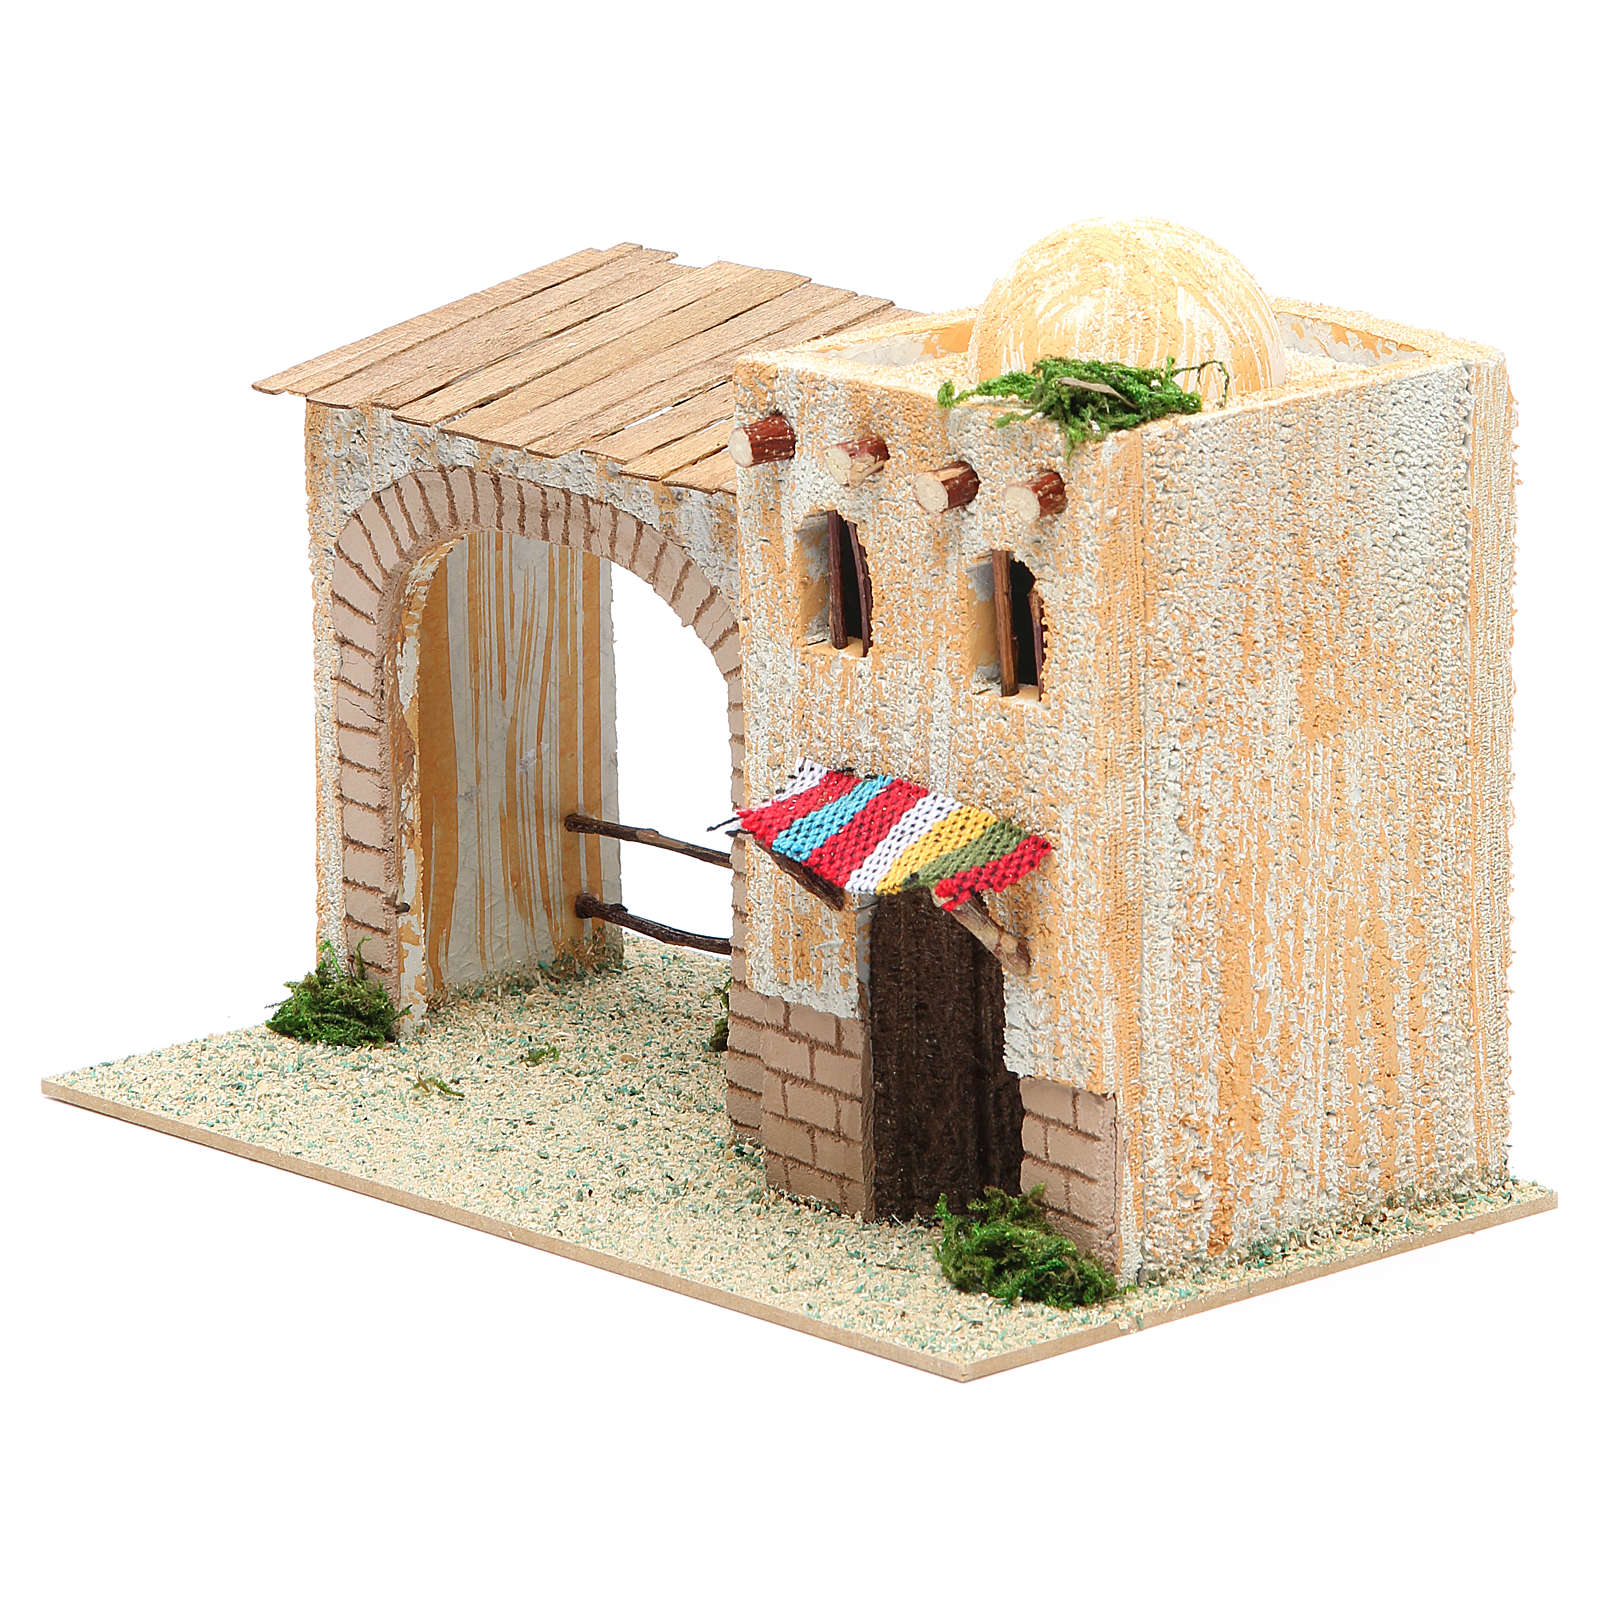 Arabian style house with veranda measuring 22x13x14cm 4